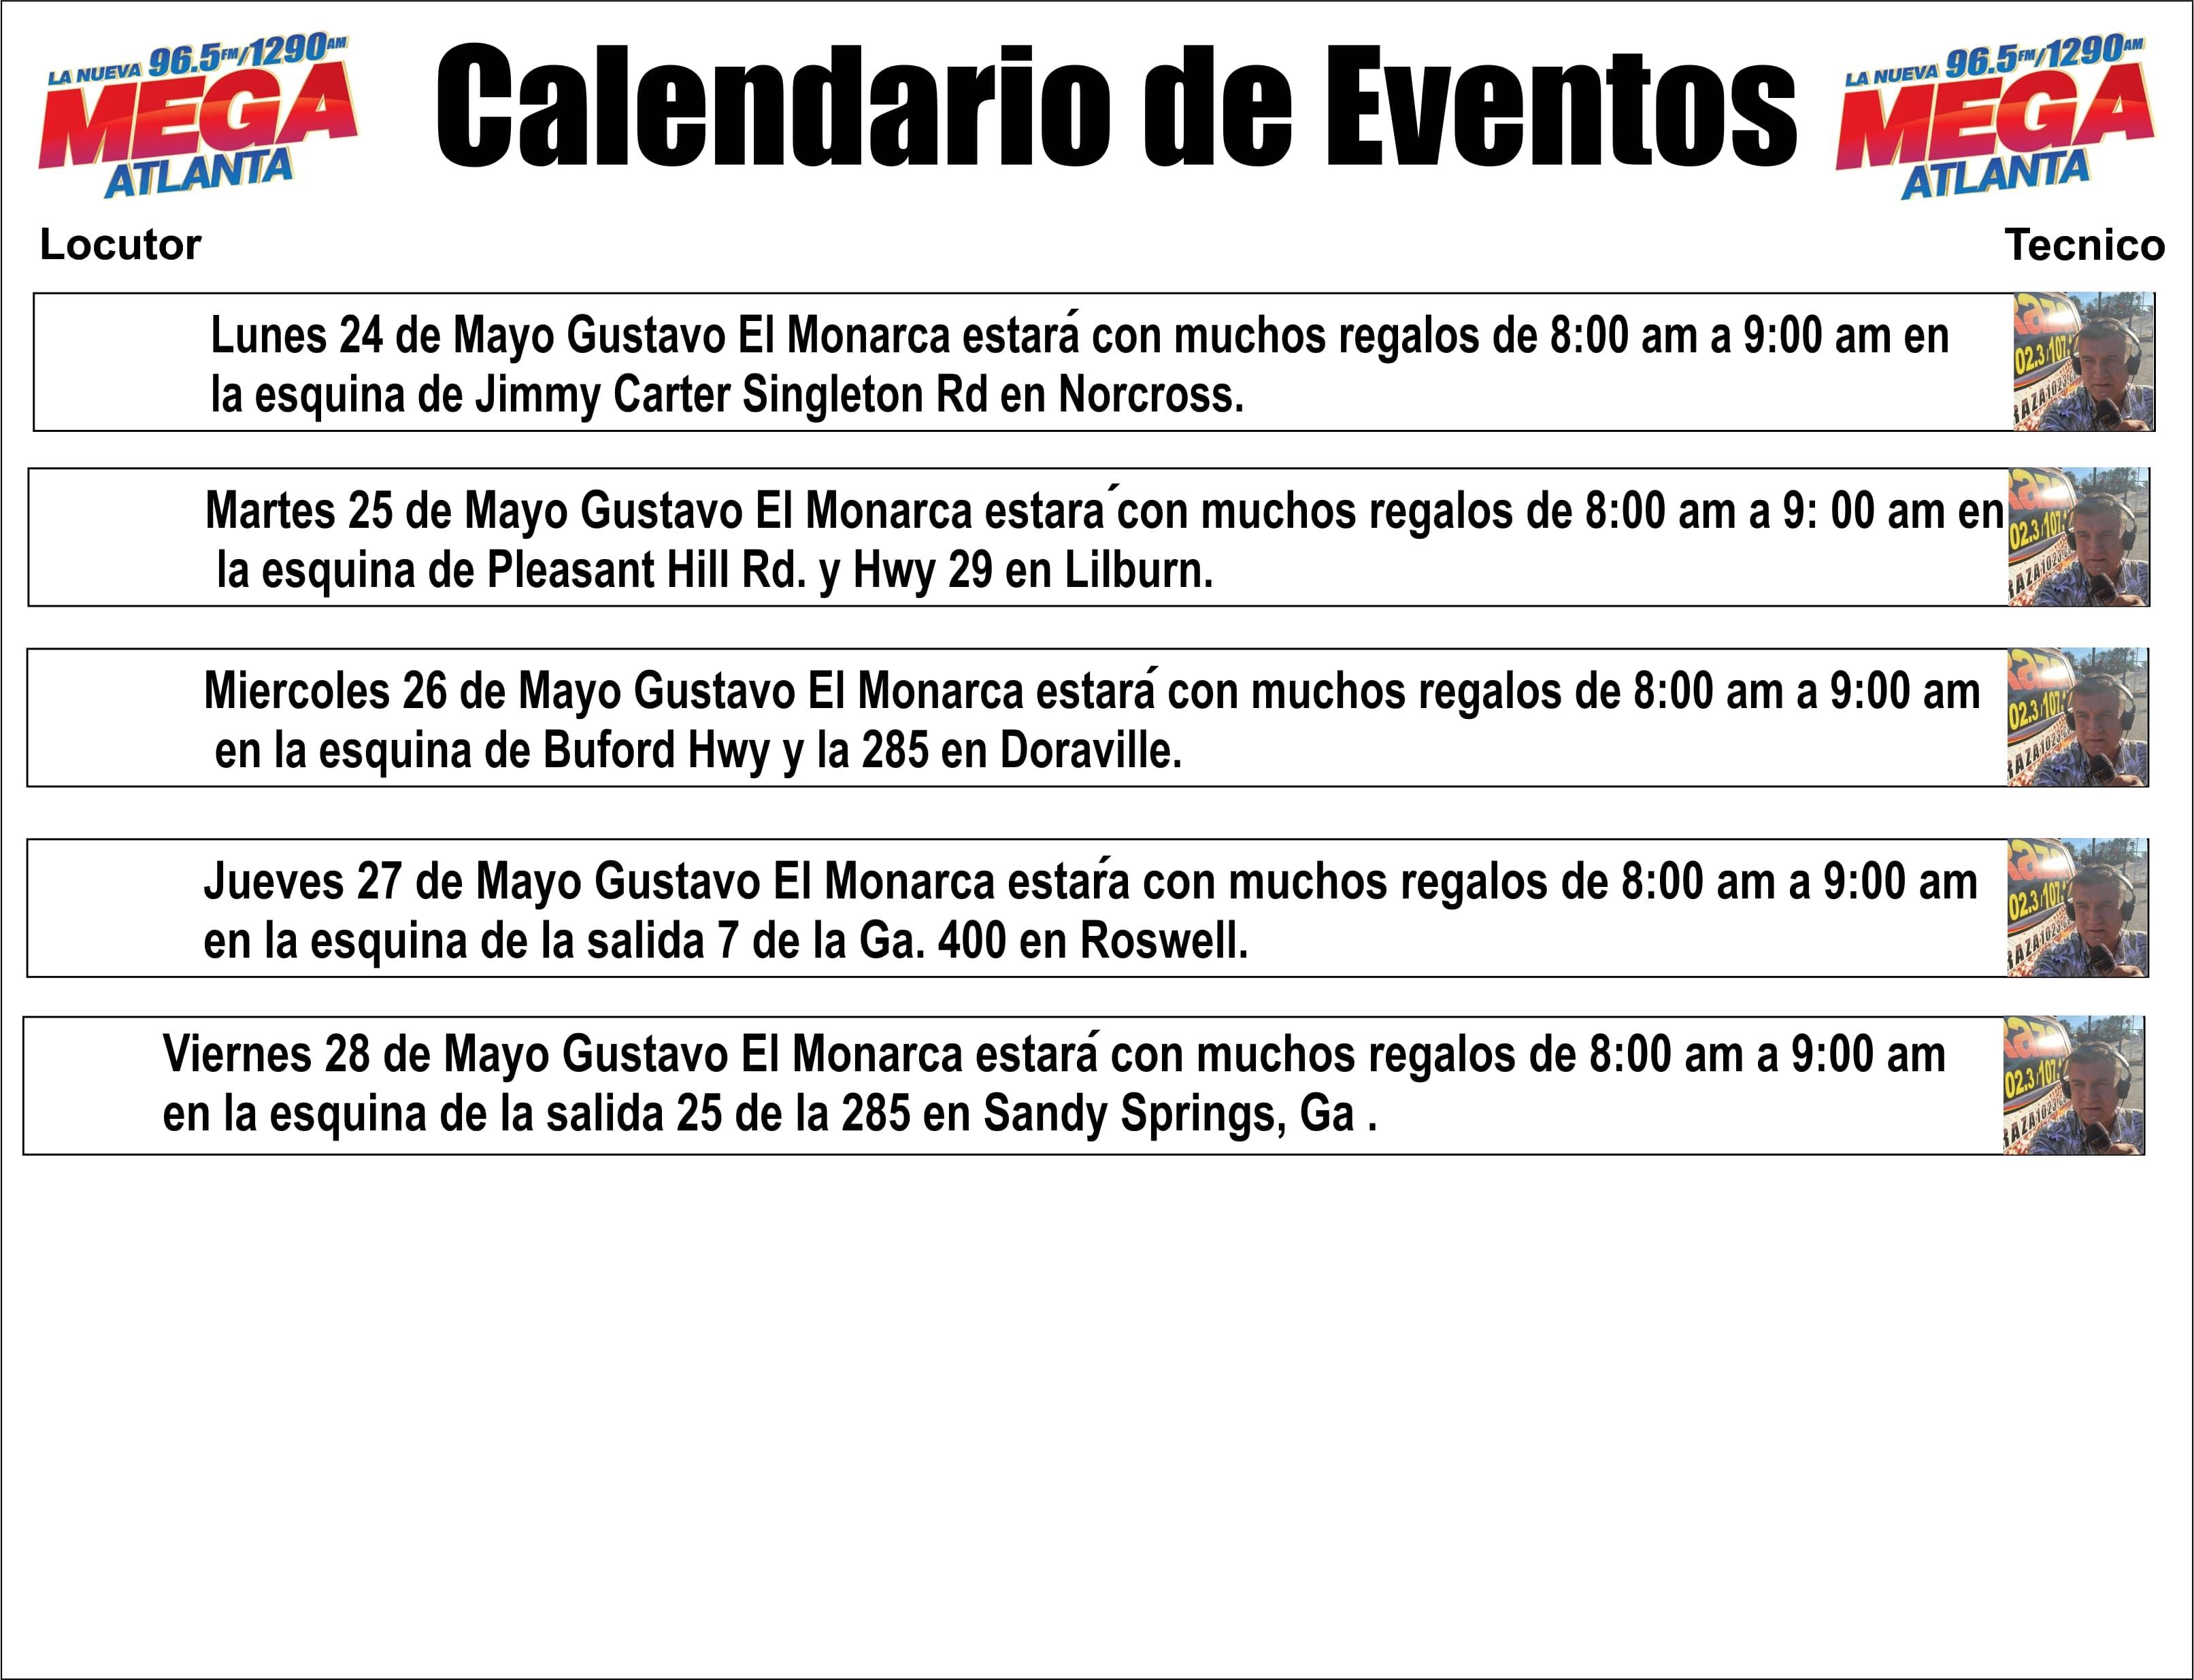 Calendarios-Mega-28-de-mayo